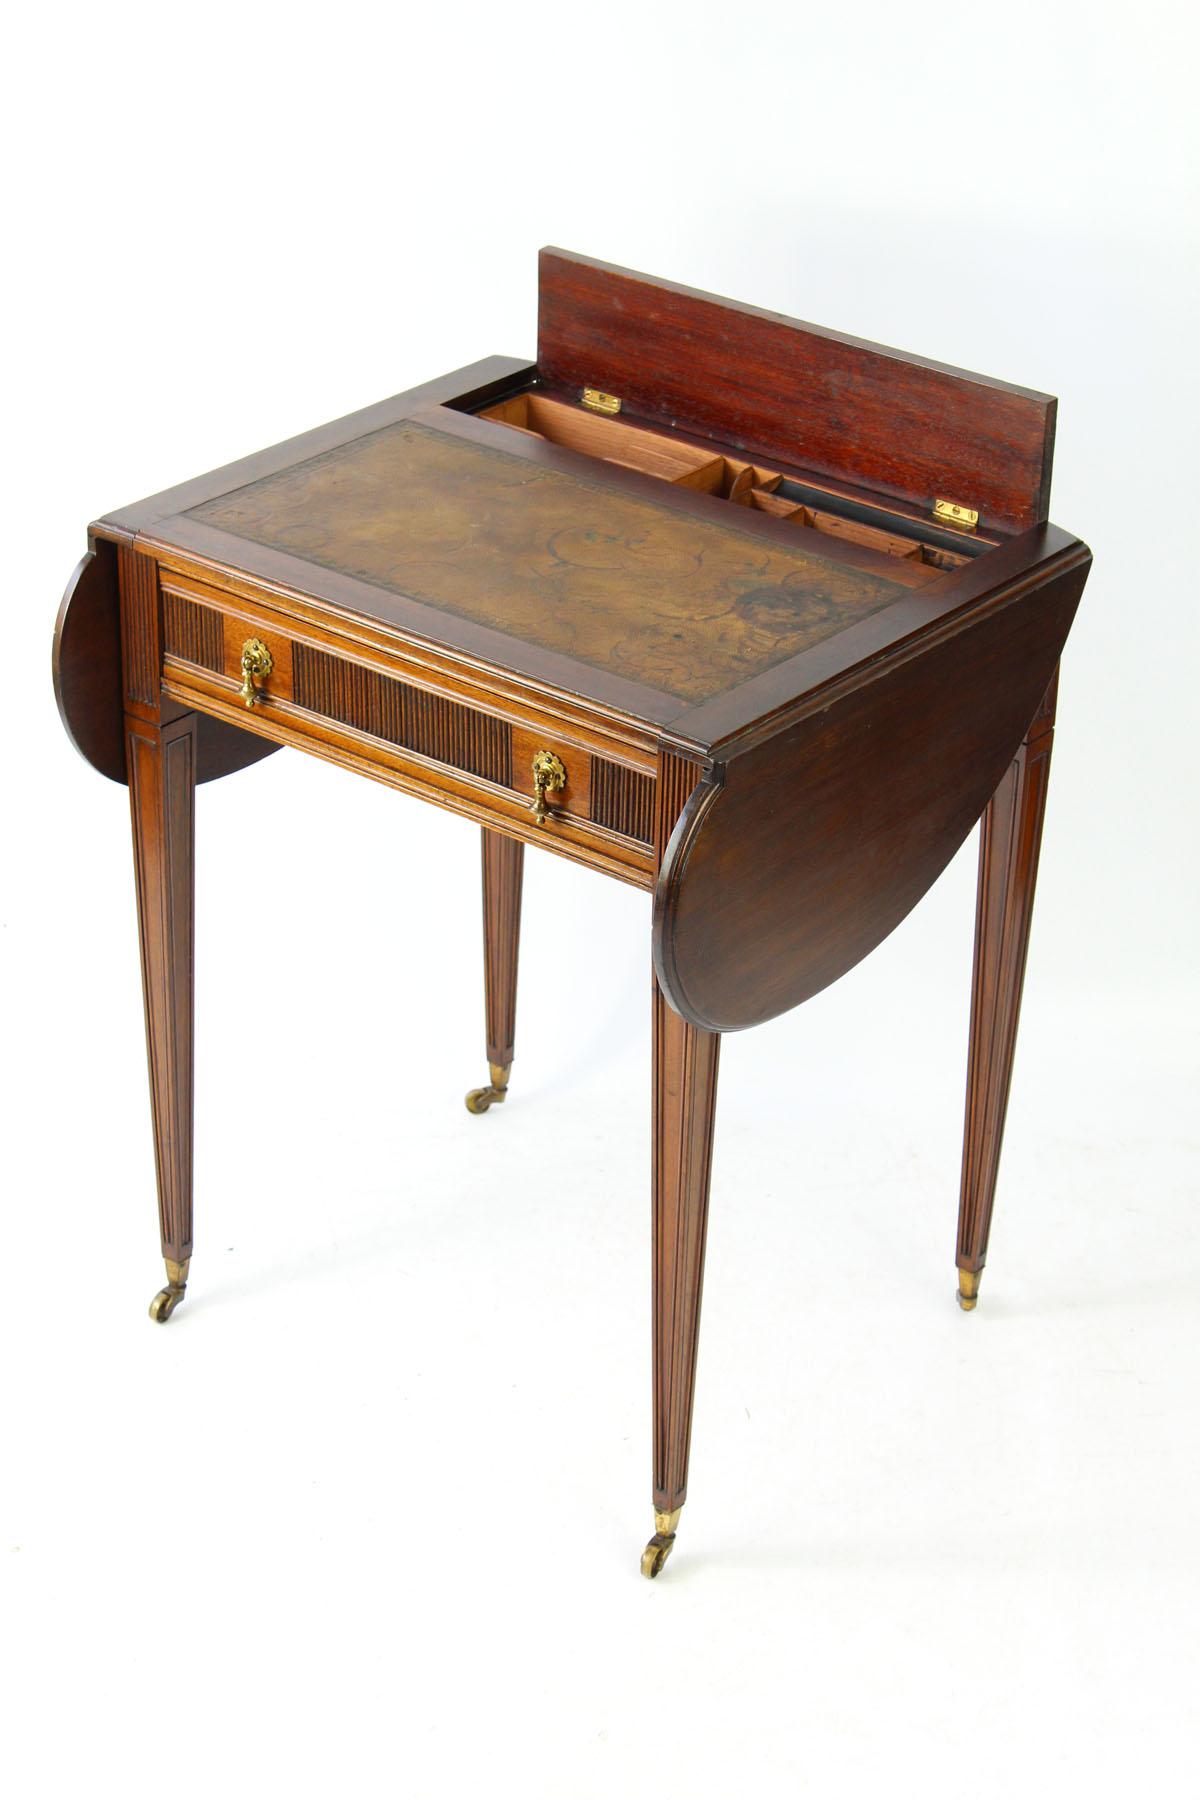 Small Edwardian Ladies Writing Desk With Glasgow Label